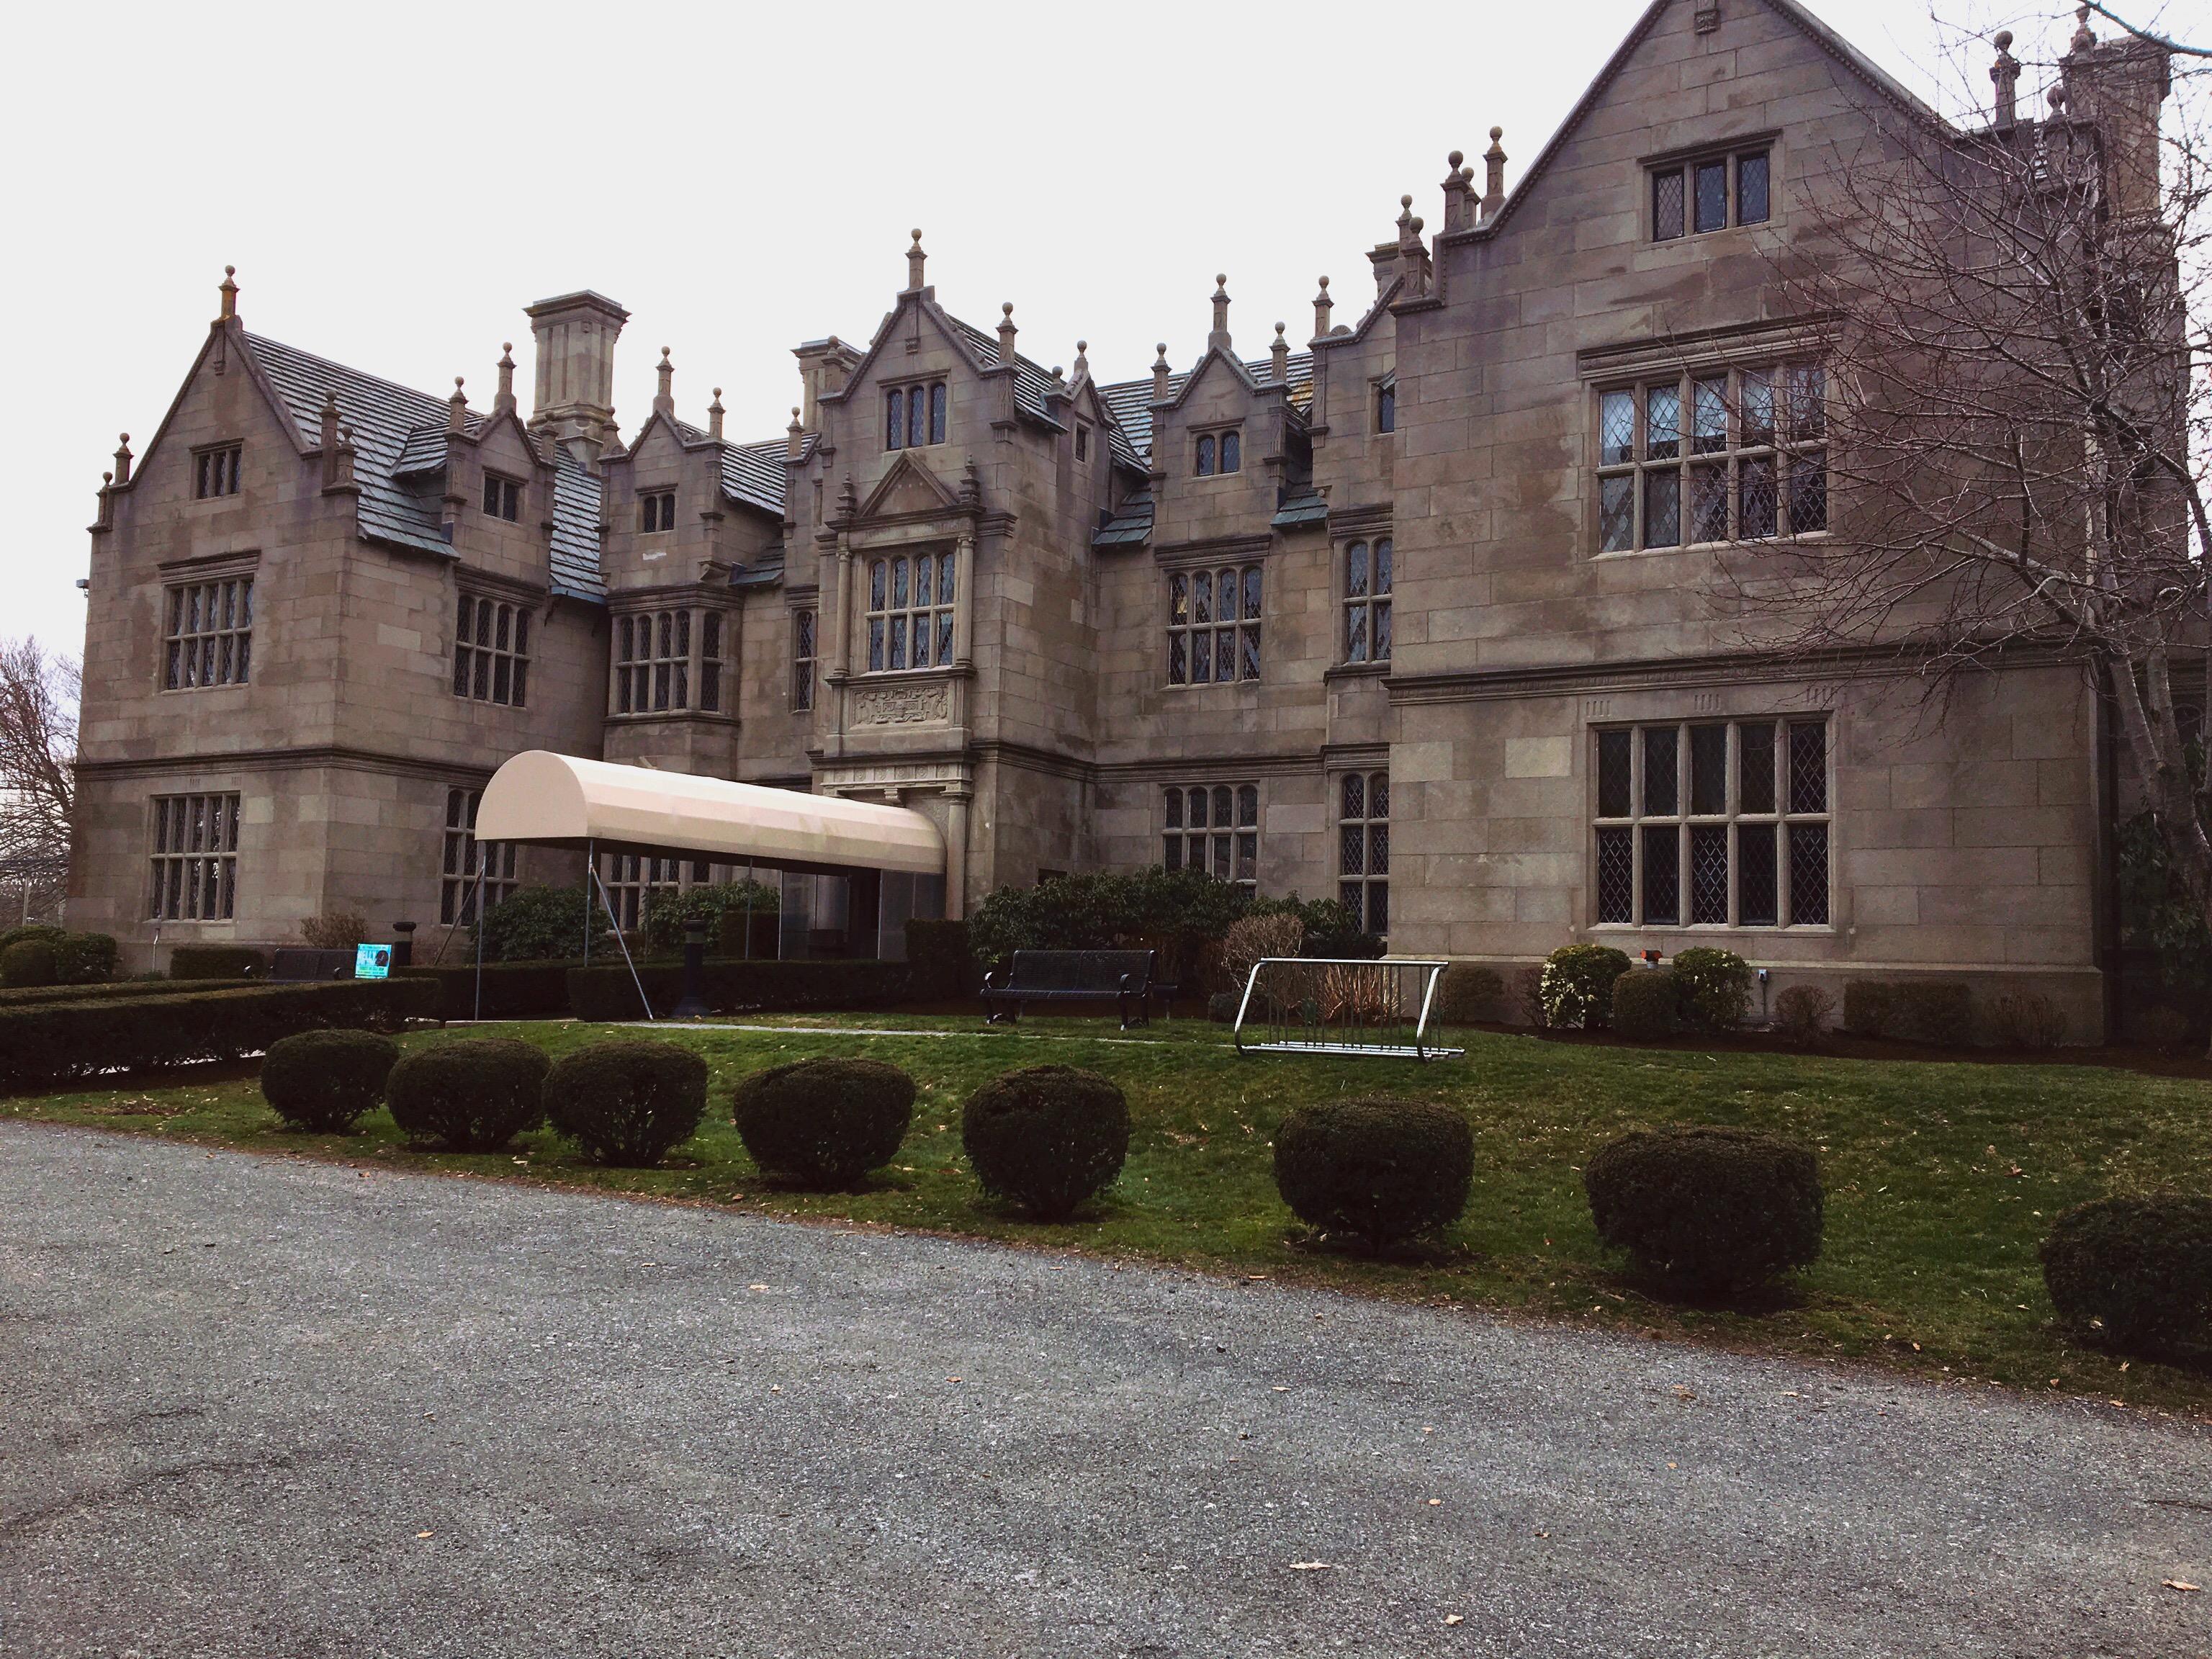 Front view of Wakehurst